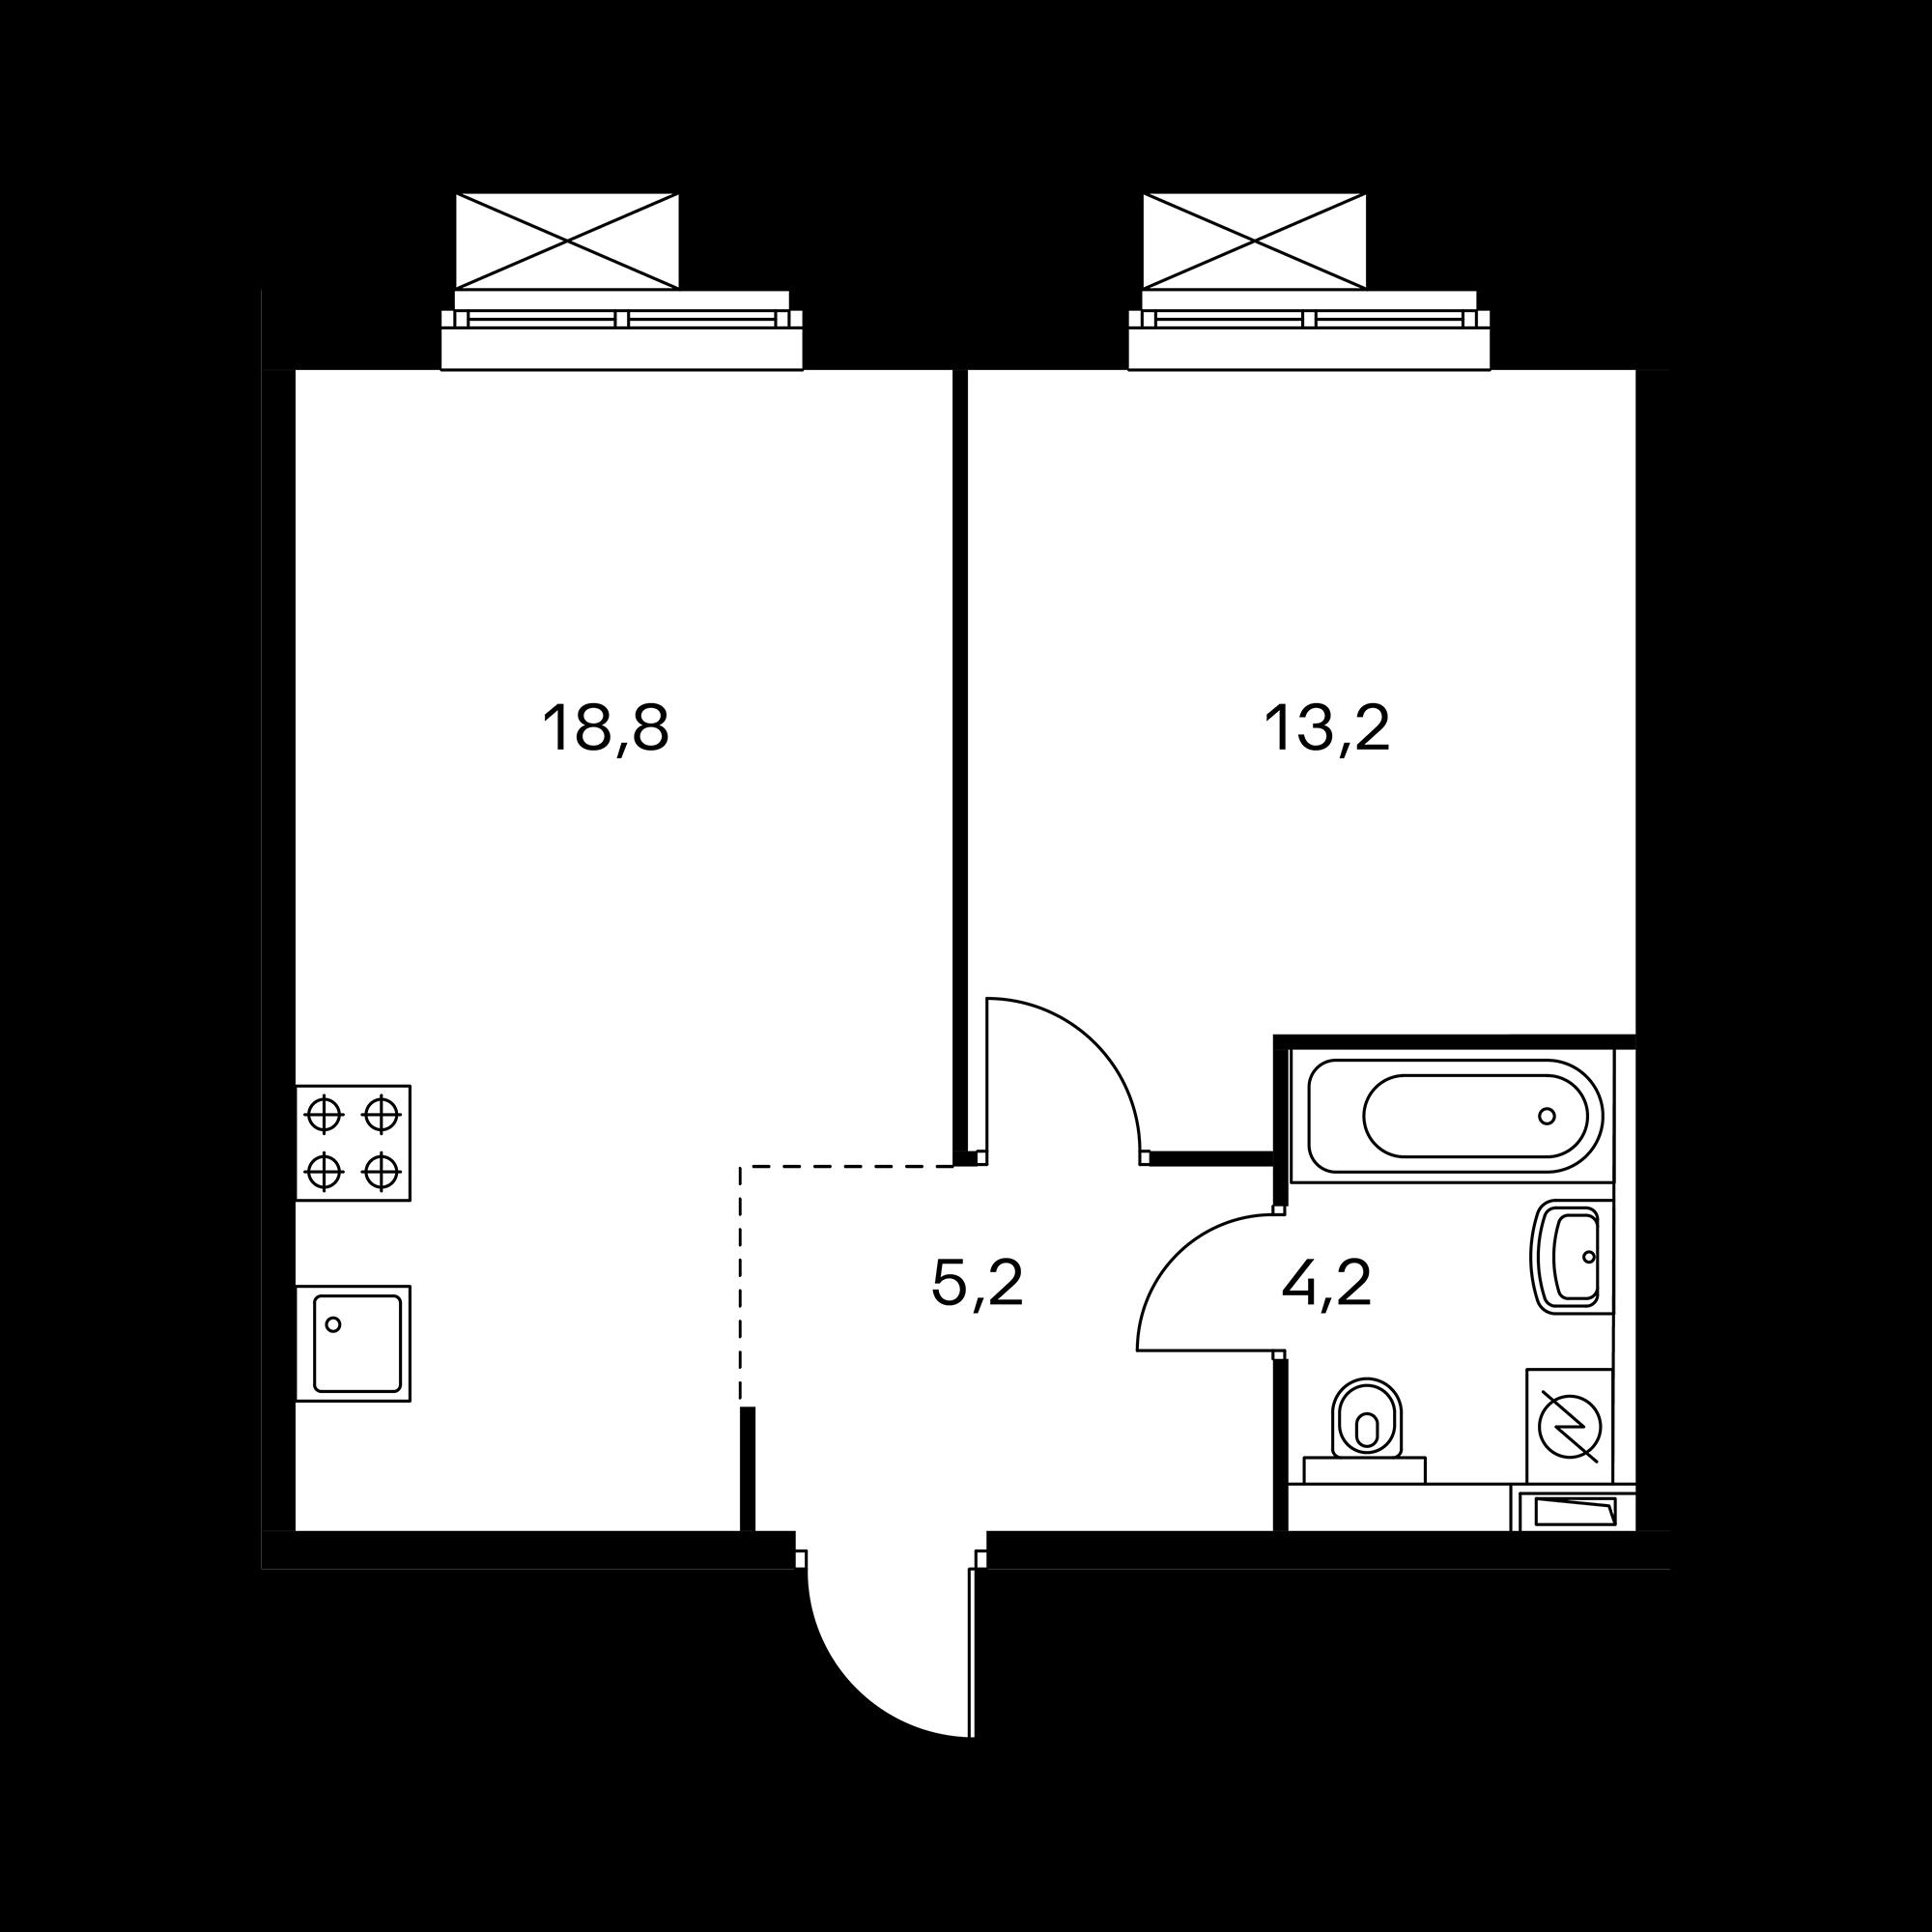 1EM4_7.2-1